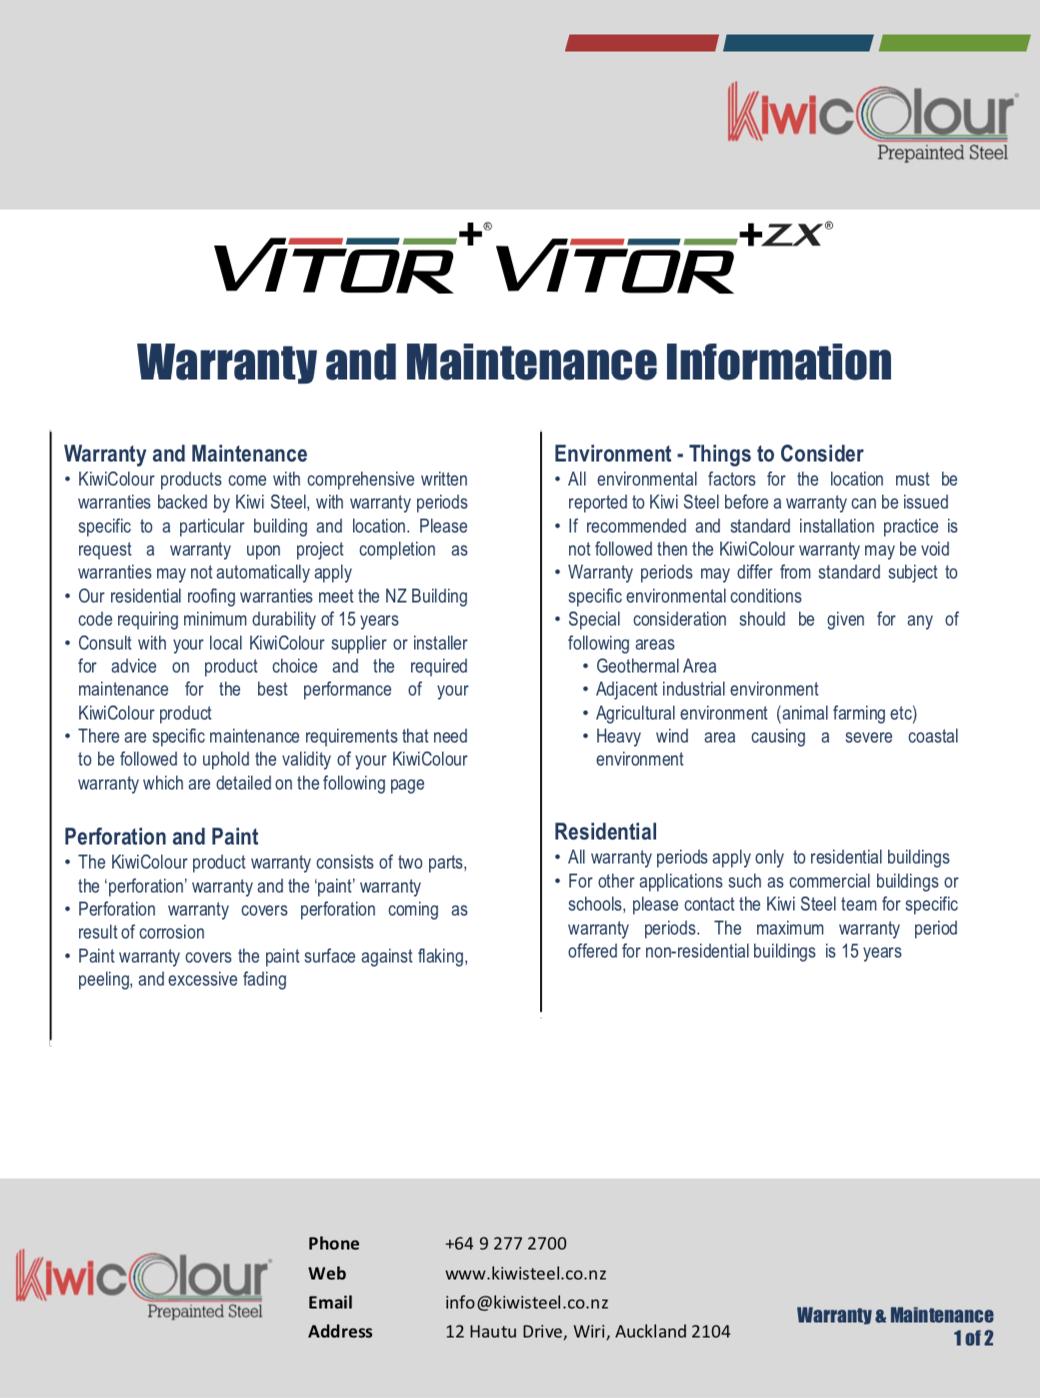 KiwiColour Pre-Painted Steel – Warranty Image.png